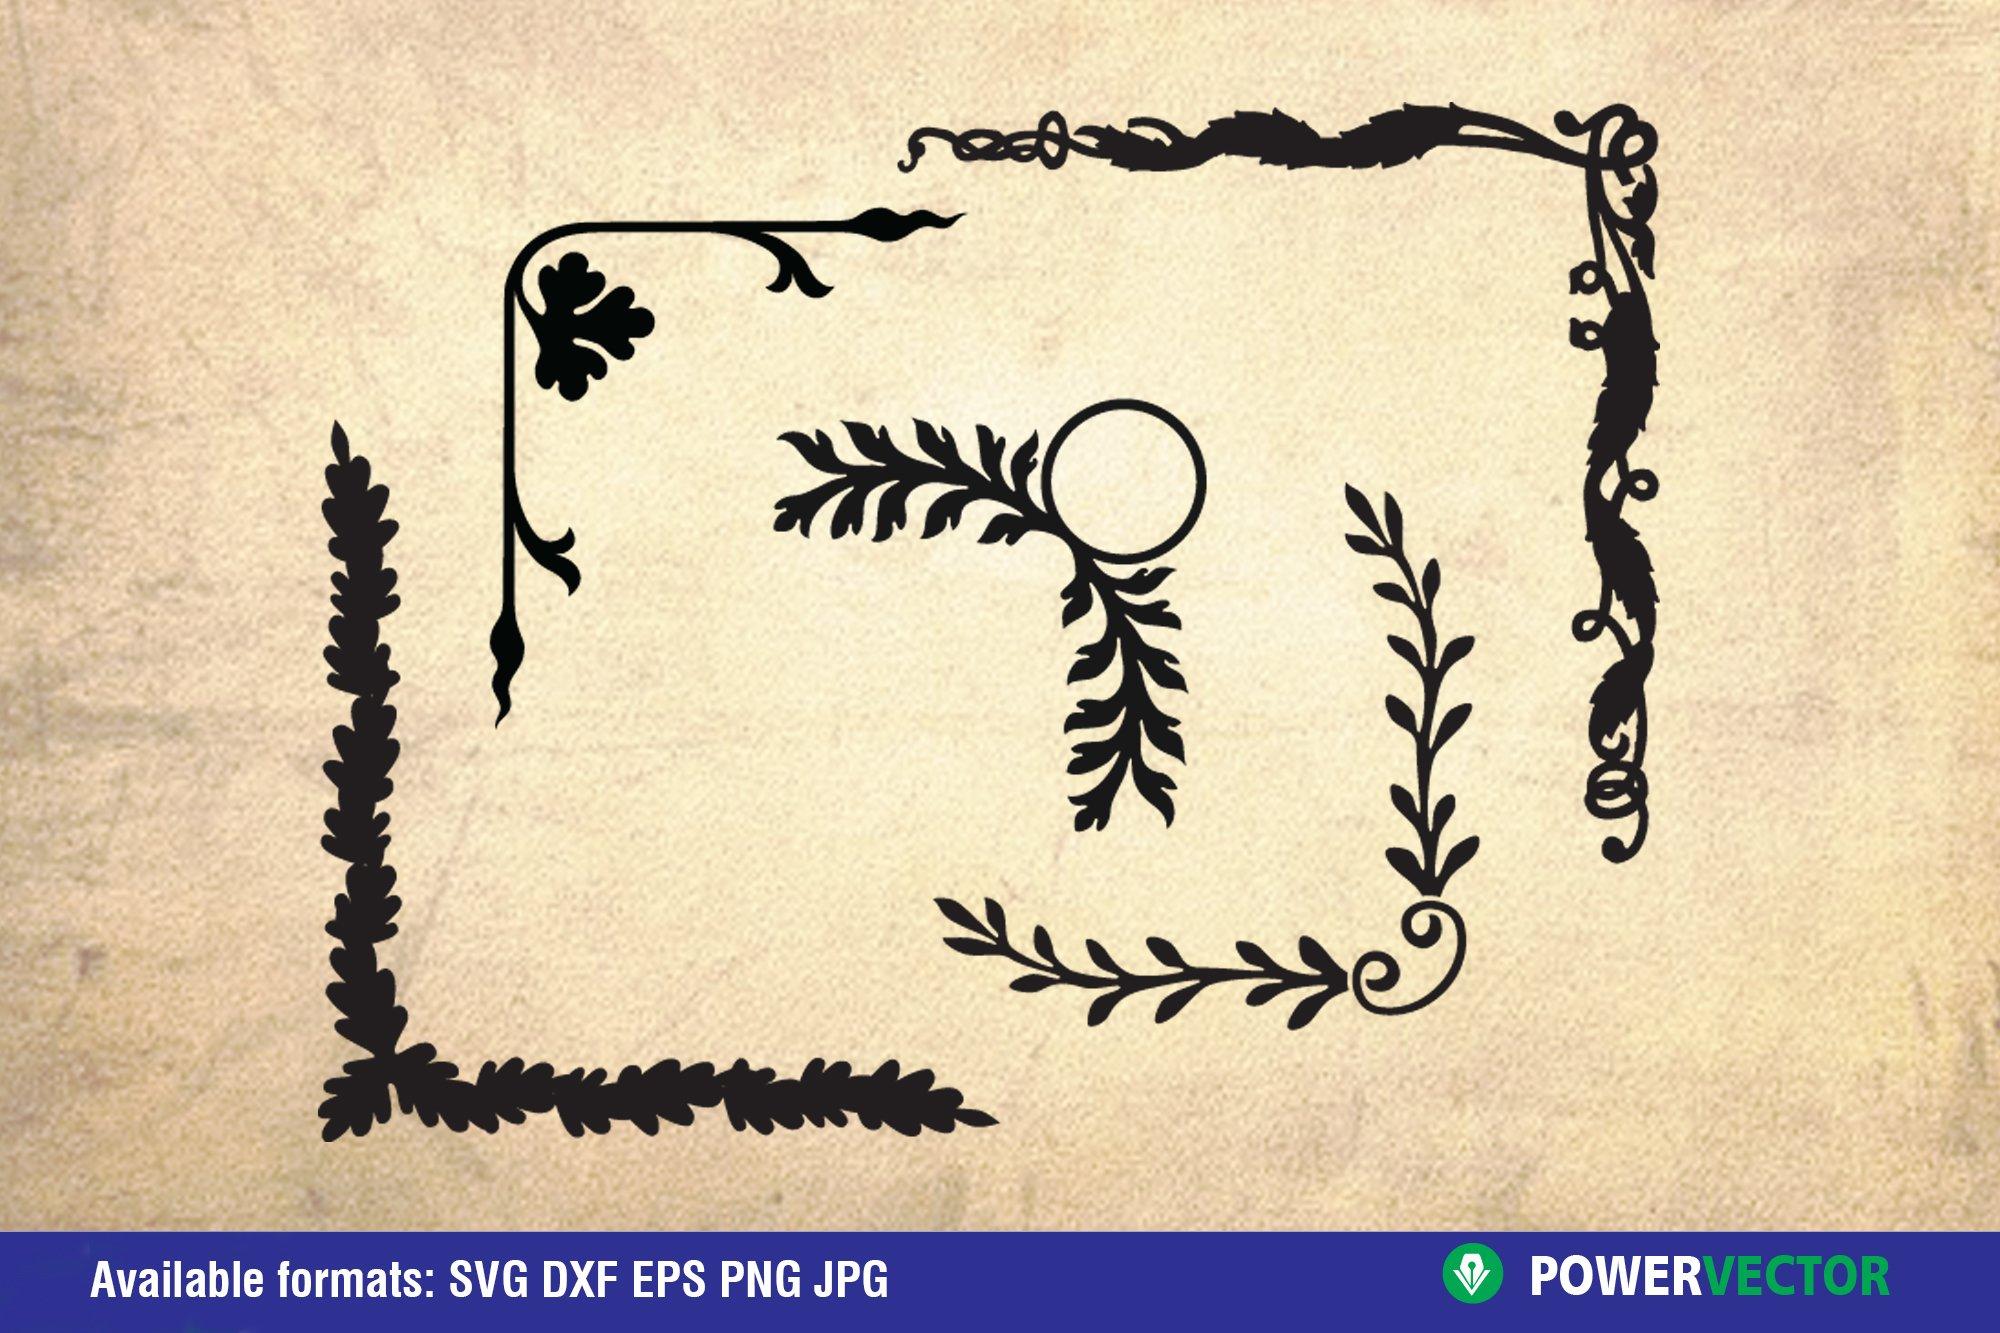 Flowers and Laurel Wreaths SVG Bundle example image 4